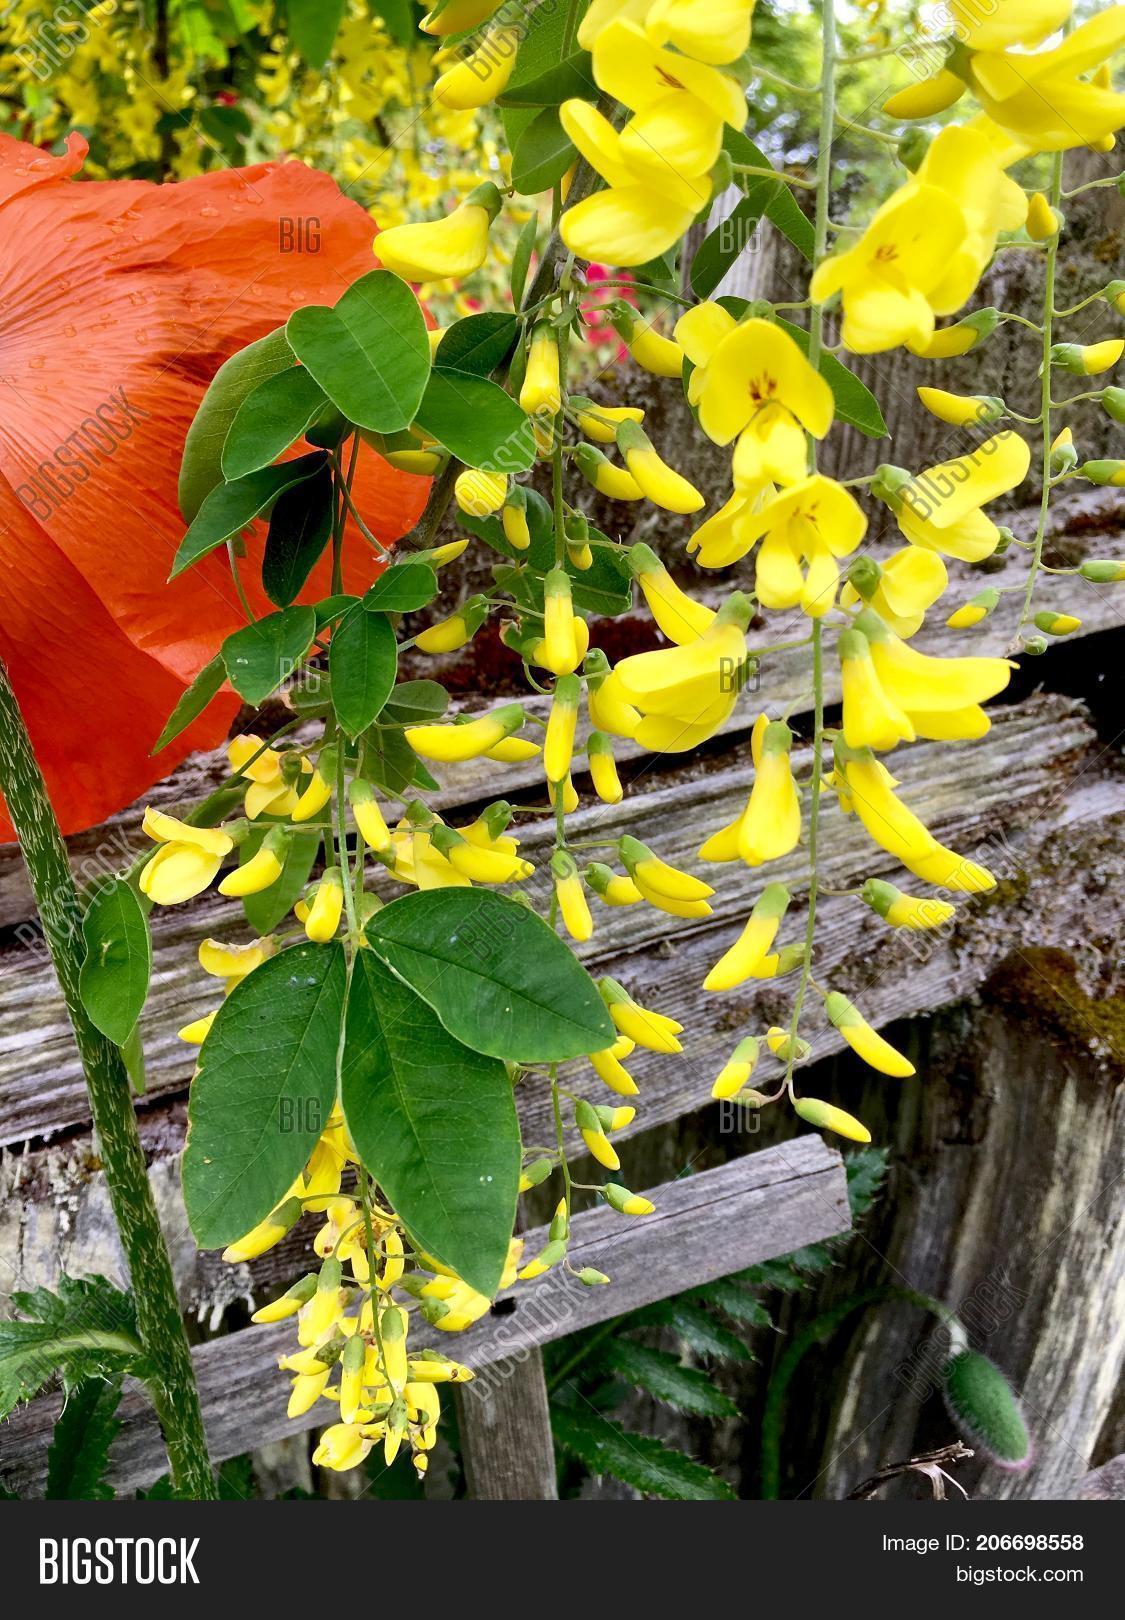 Yellow Hanging Flowers Image Photo Free Trial Bigstock